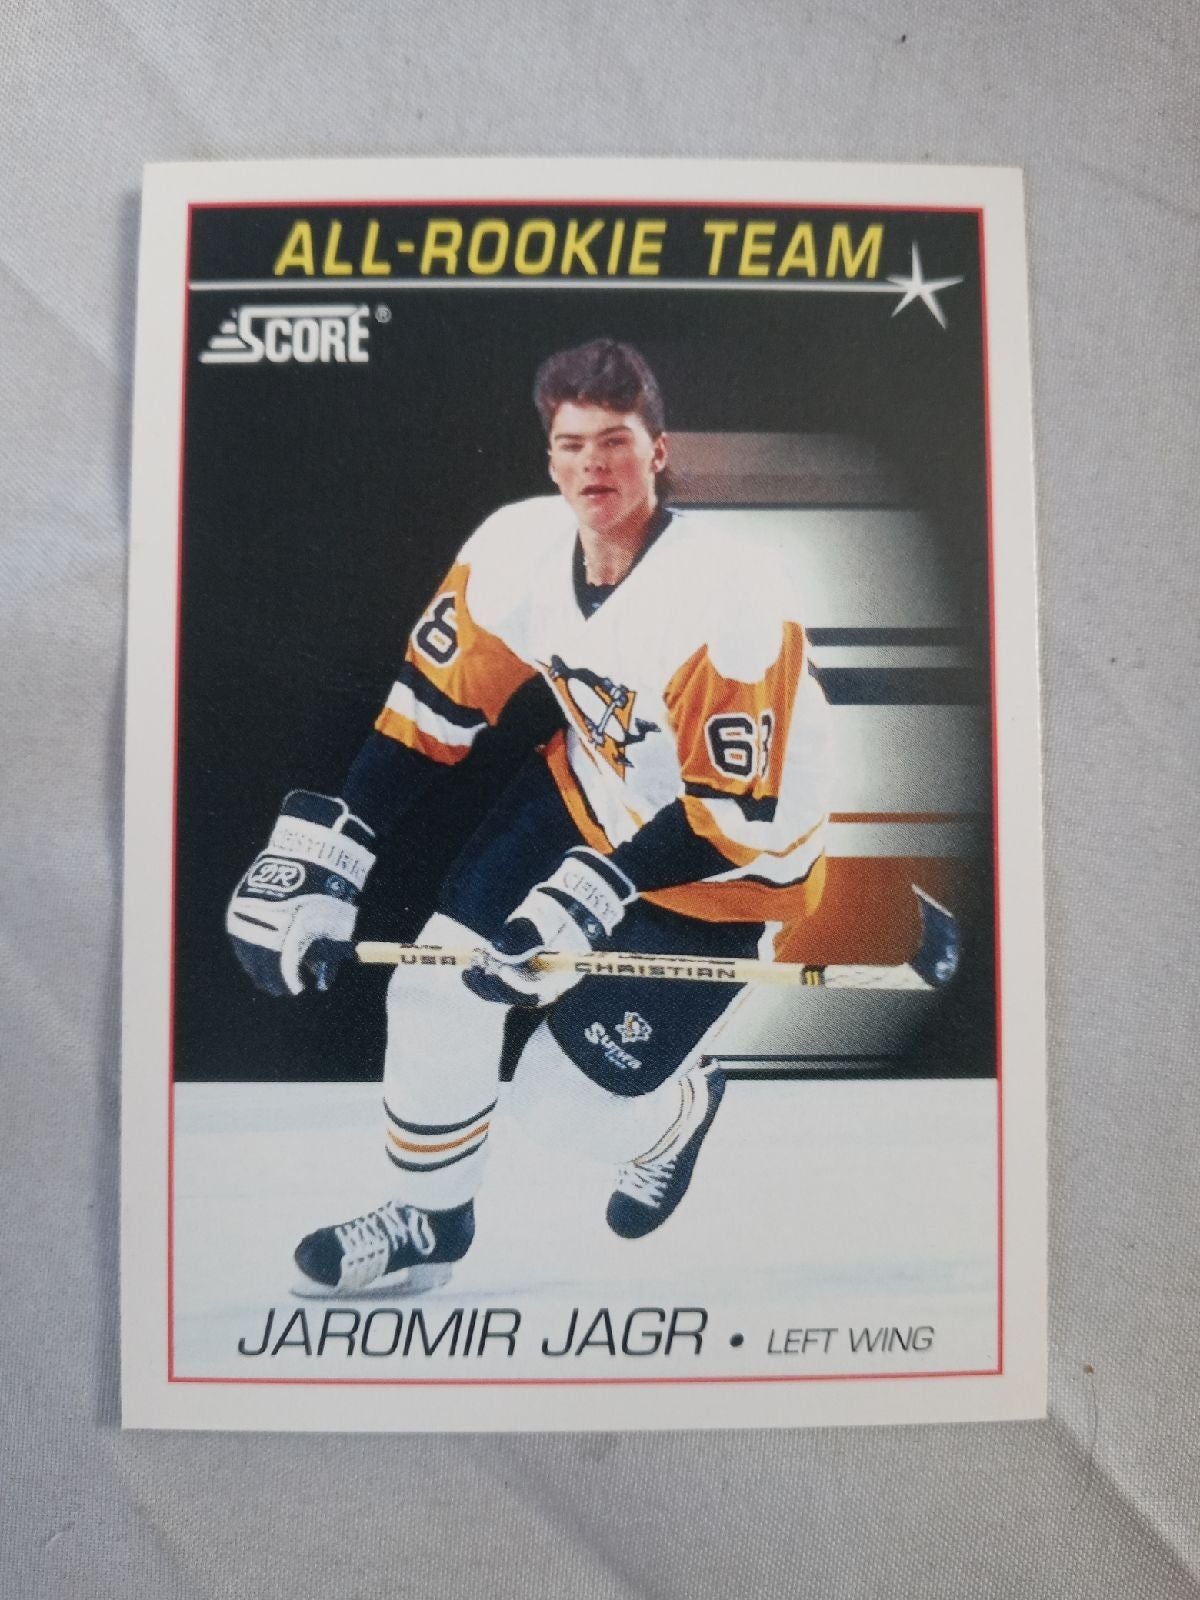 Jaromir Jagr 1991 score rookie card